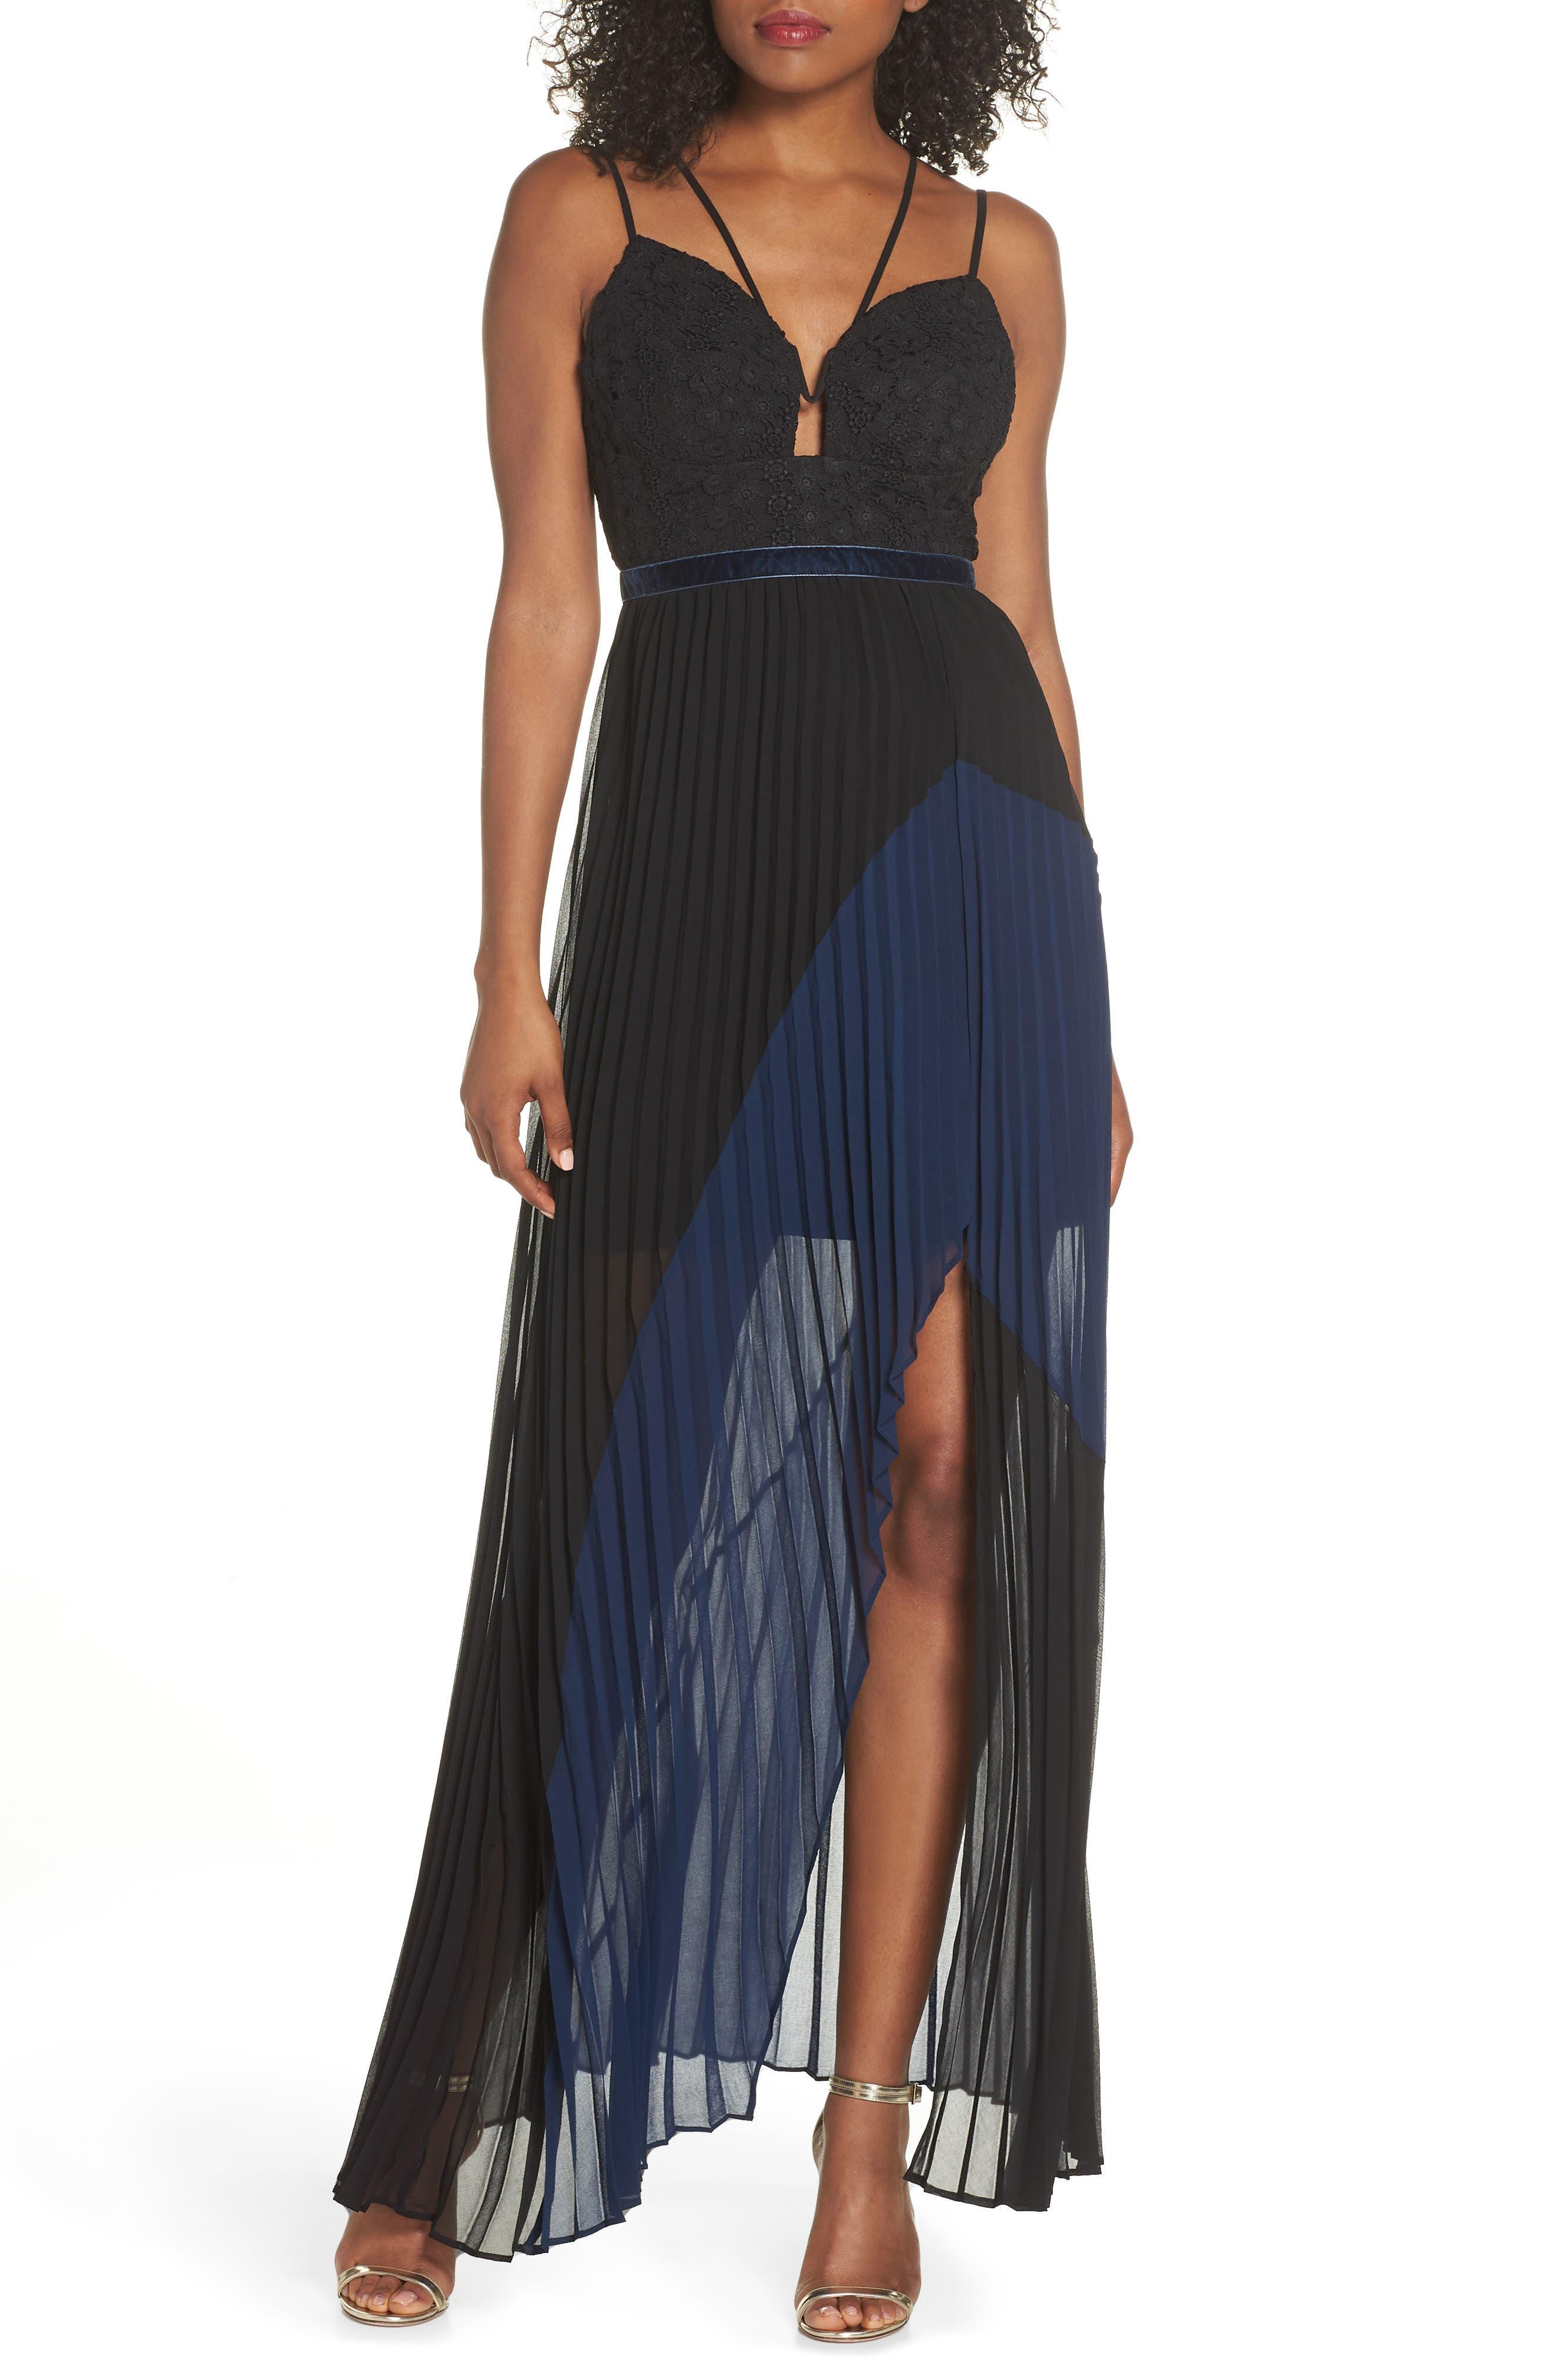 Nealea Pleat Chiffon Gown,                             Main thumbnail 1, color,                             Black/ Navy